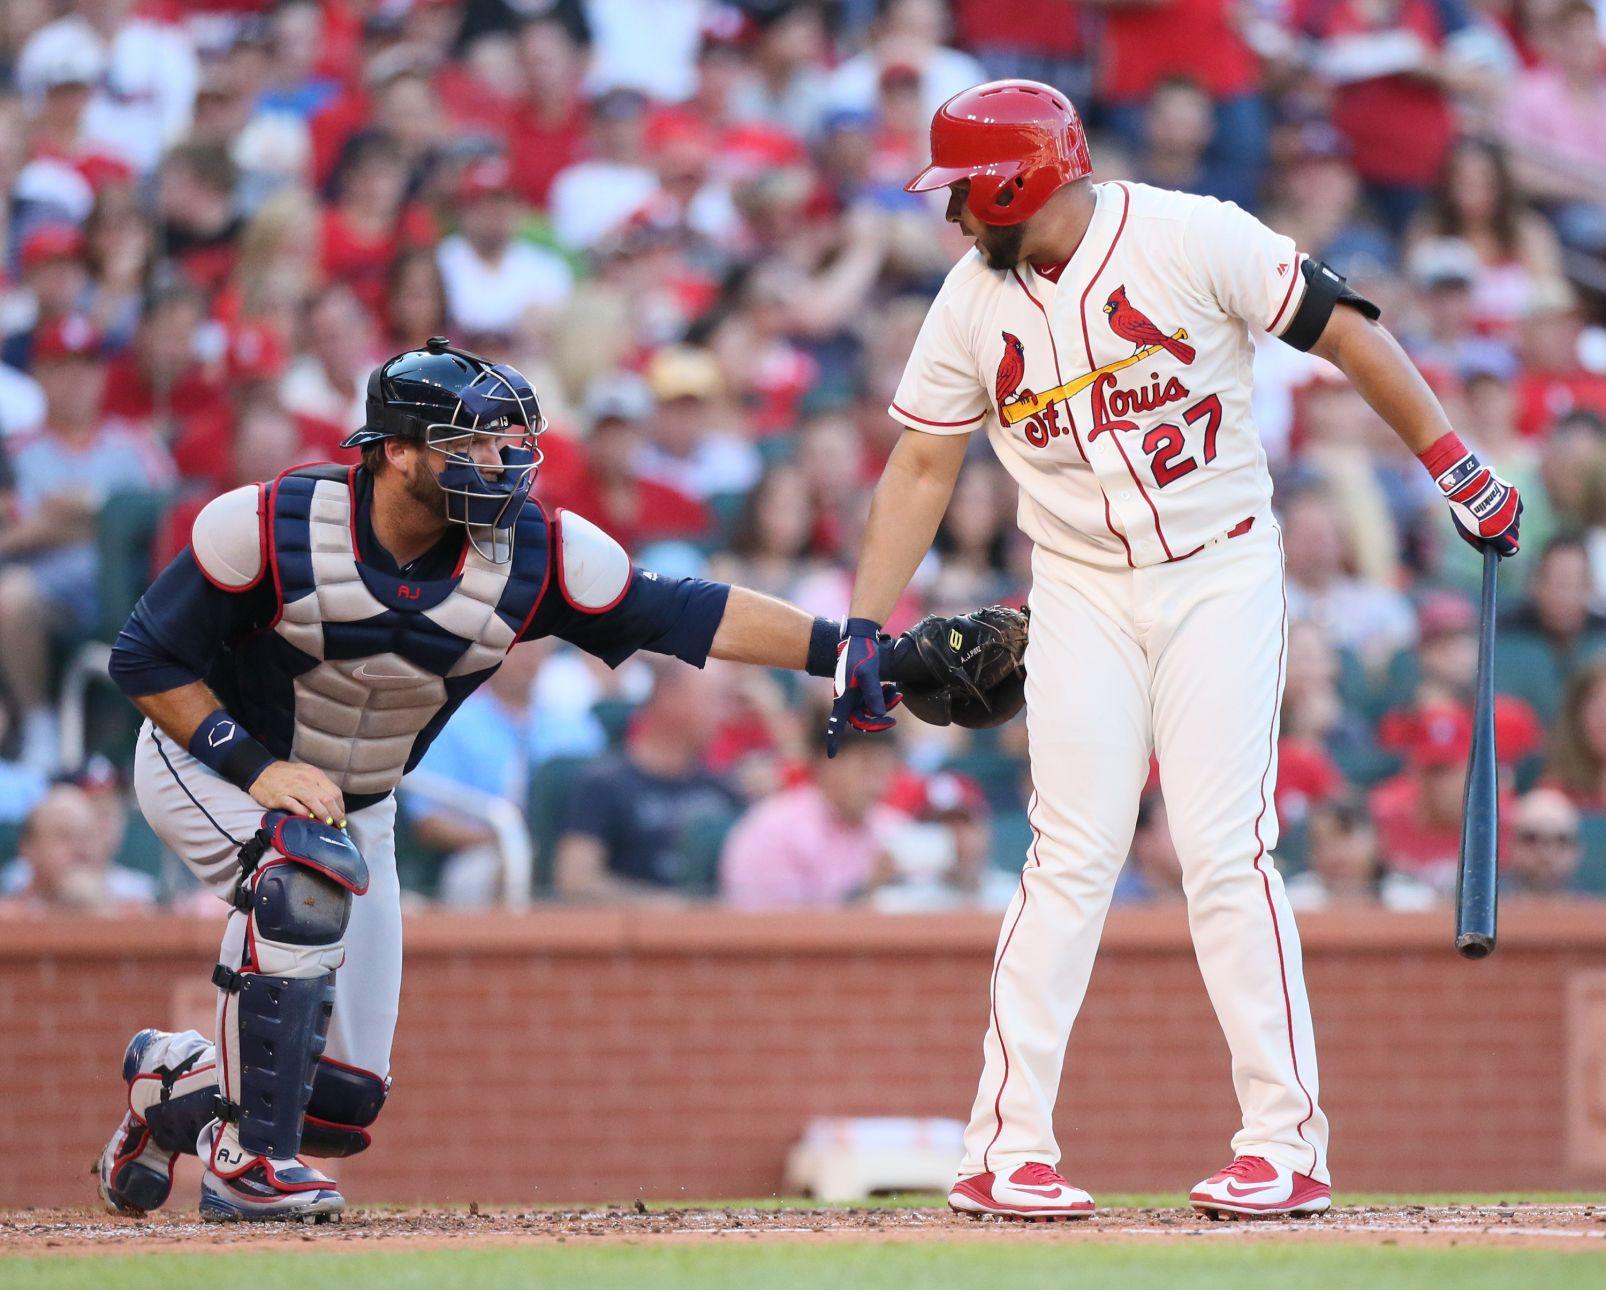 Cardinals notes: Peralta adjusting to being back at shortstop